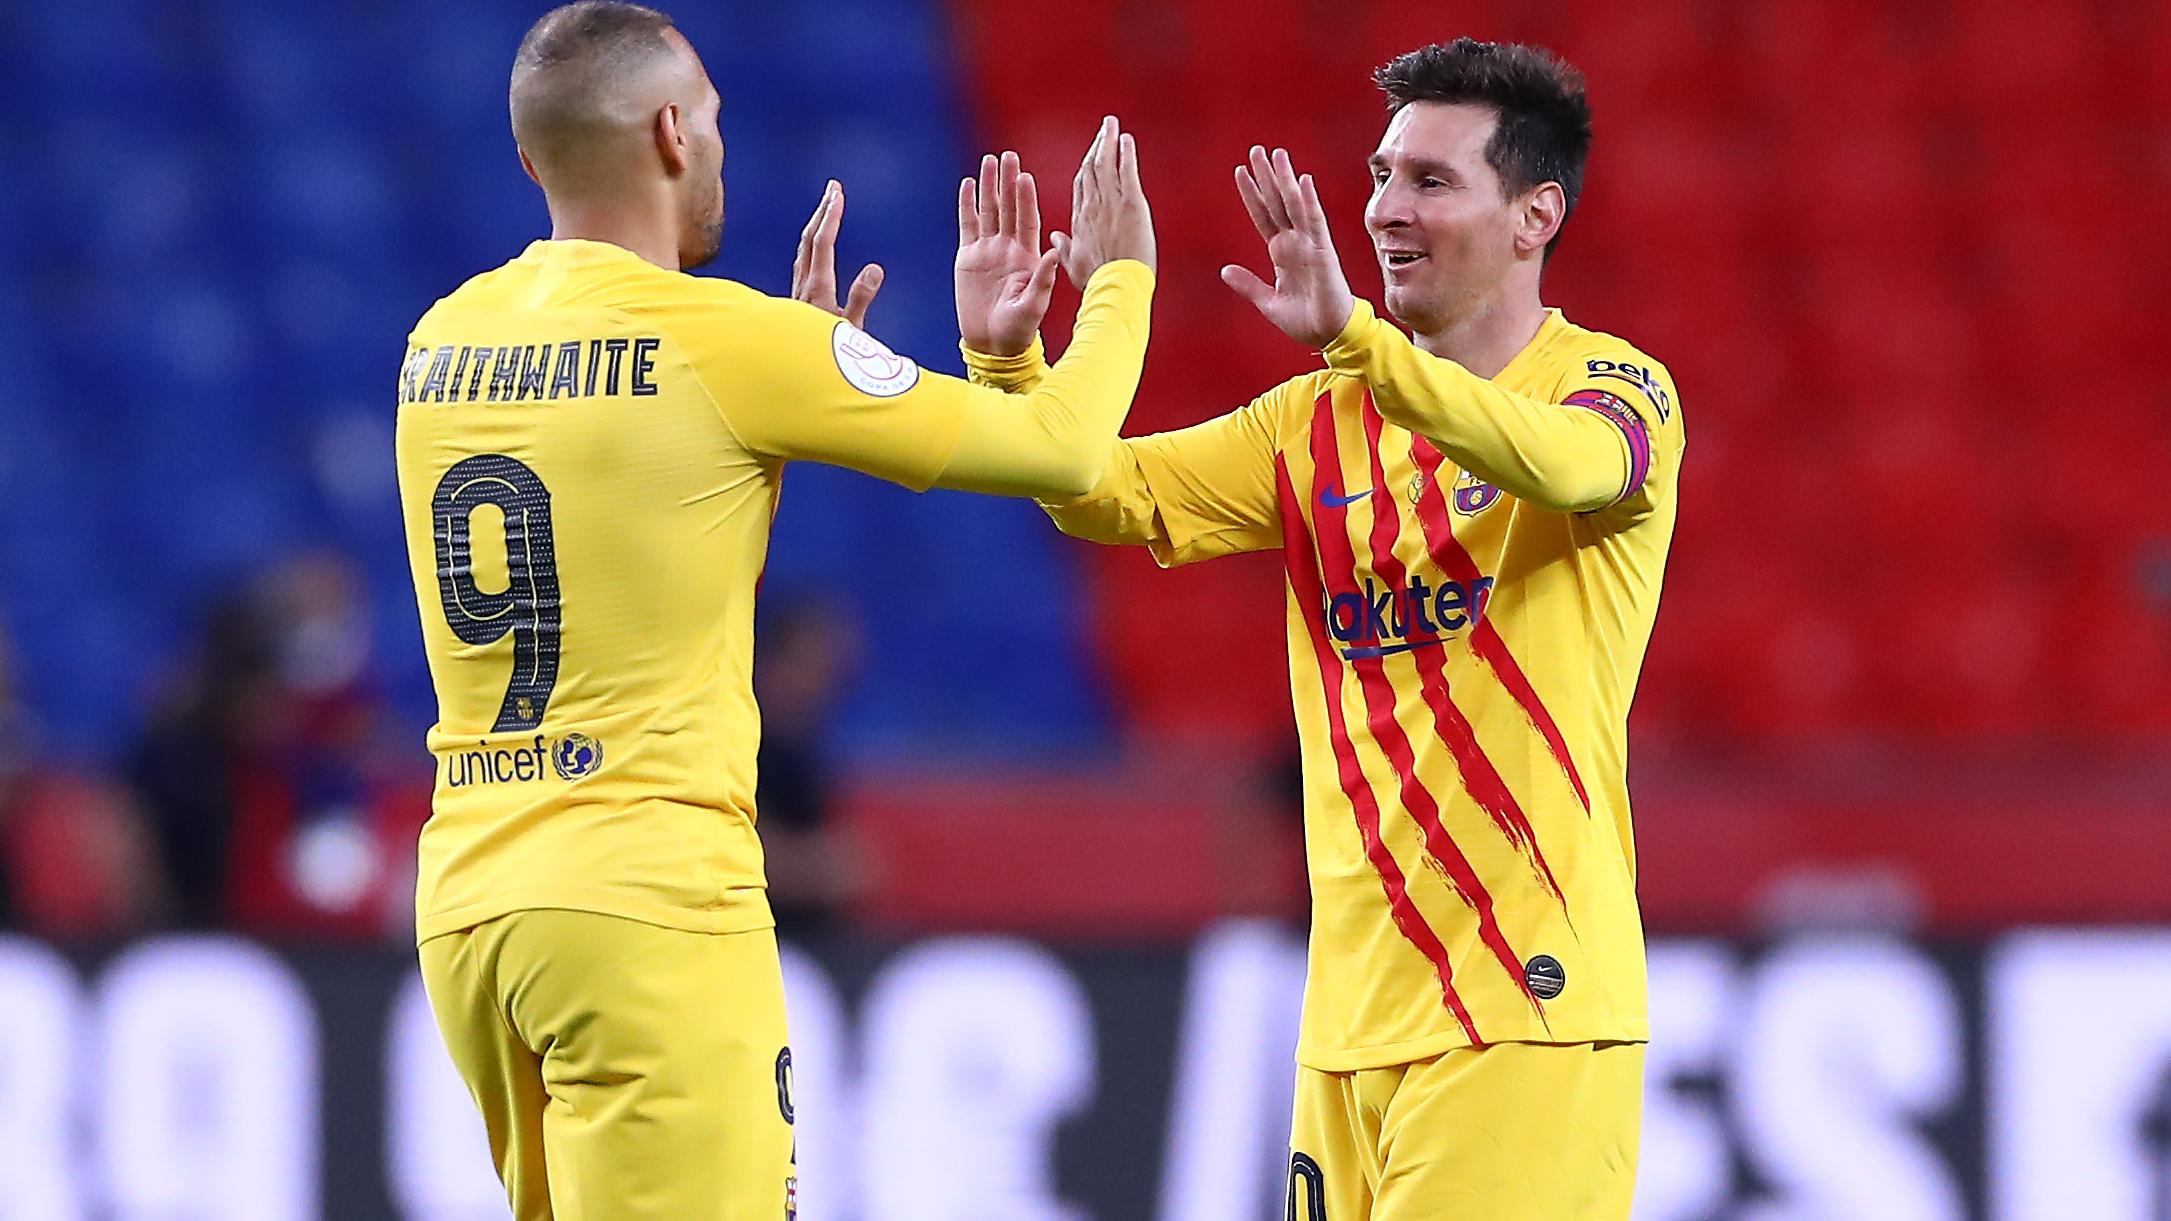 Messi breaks Copa del Rey final scoring record with brace vs Athletic | Goal.com